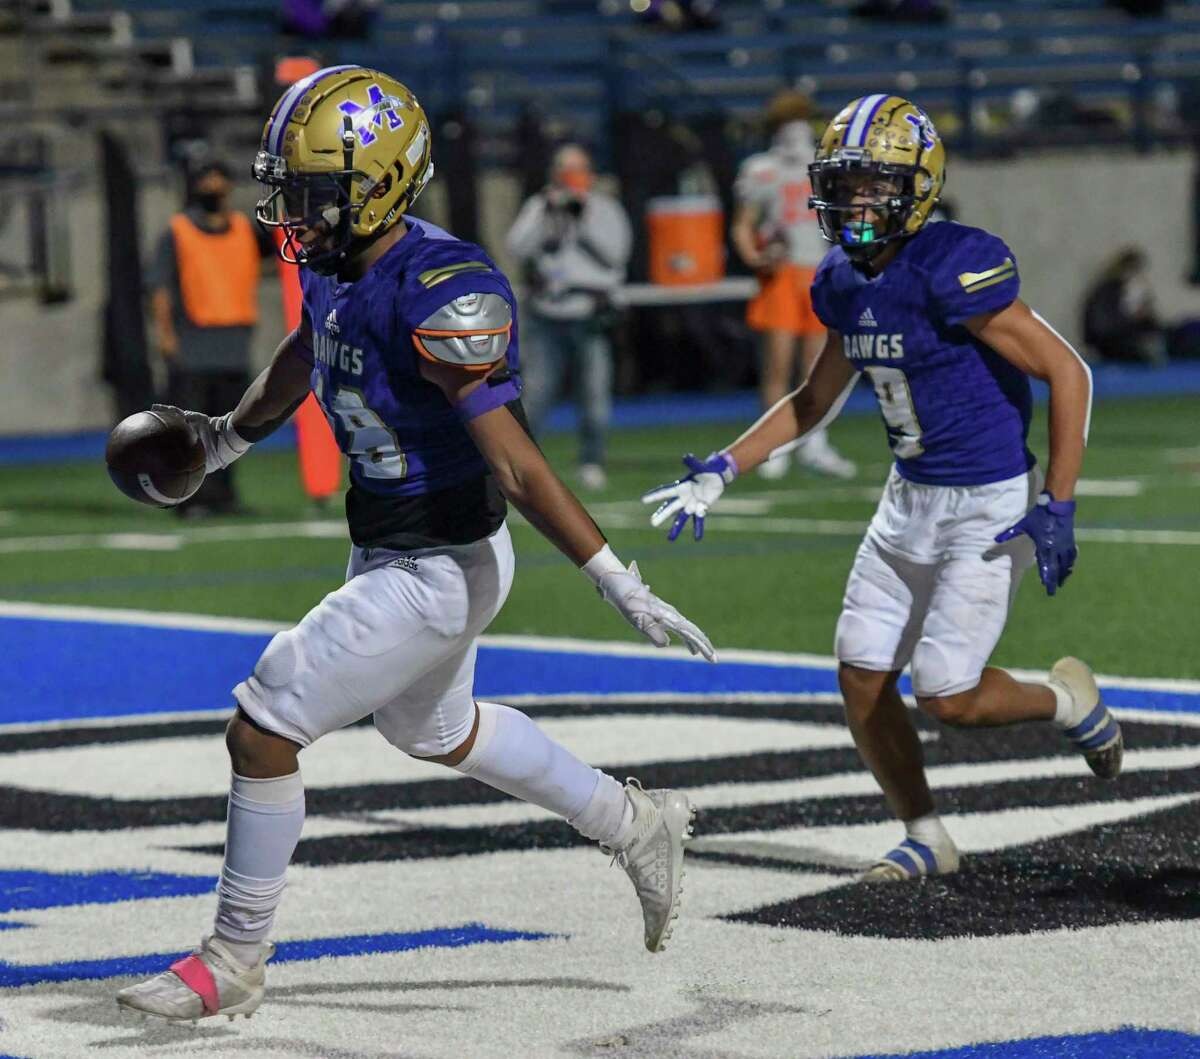 Midland High's Matteo Houston scores a touchdown while Brian'Zai Perez (9) follows him into the end zone Friday, Nov. 6, 2020 at Grande Communications Stadium. Jacy Lewis/Reporter-Telegram